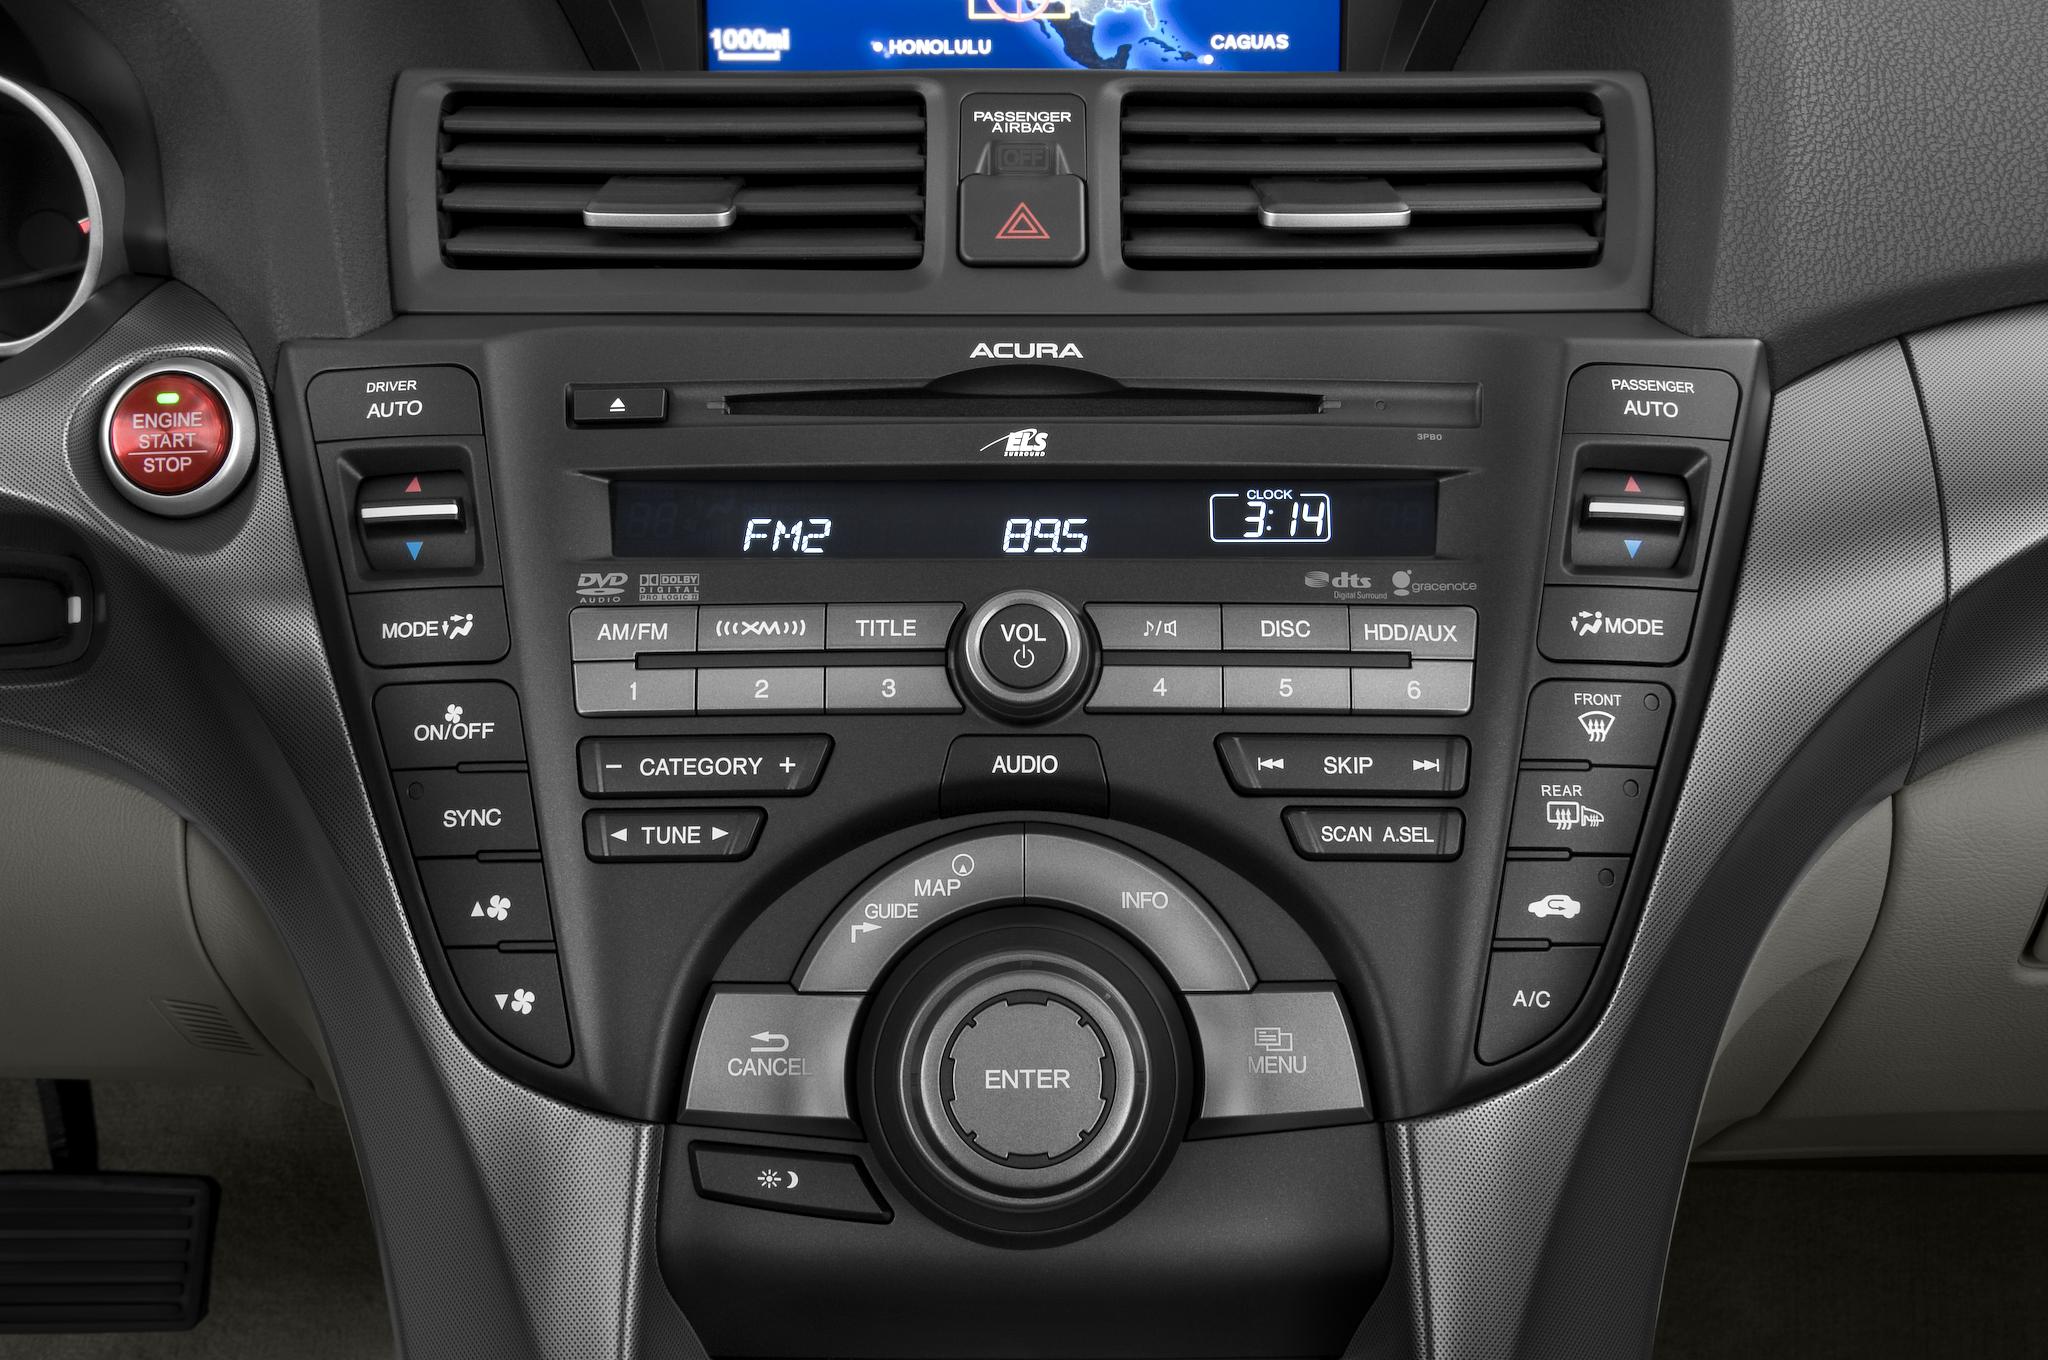 2010 Acura TL SH-AWD 6MT - Acura Midsize Sedan Review